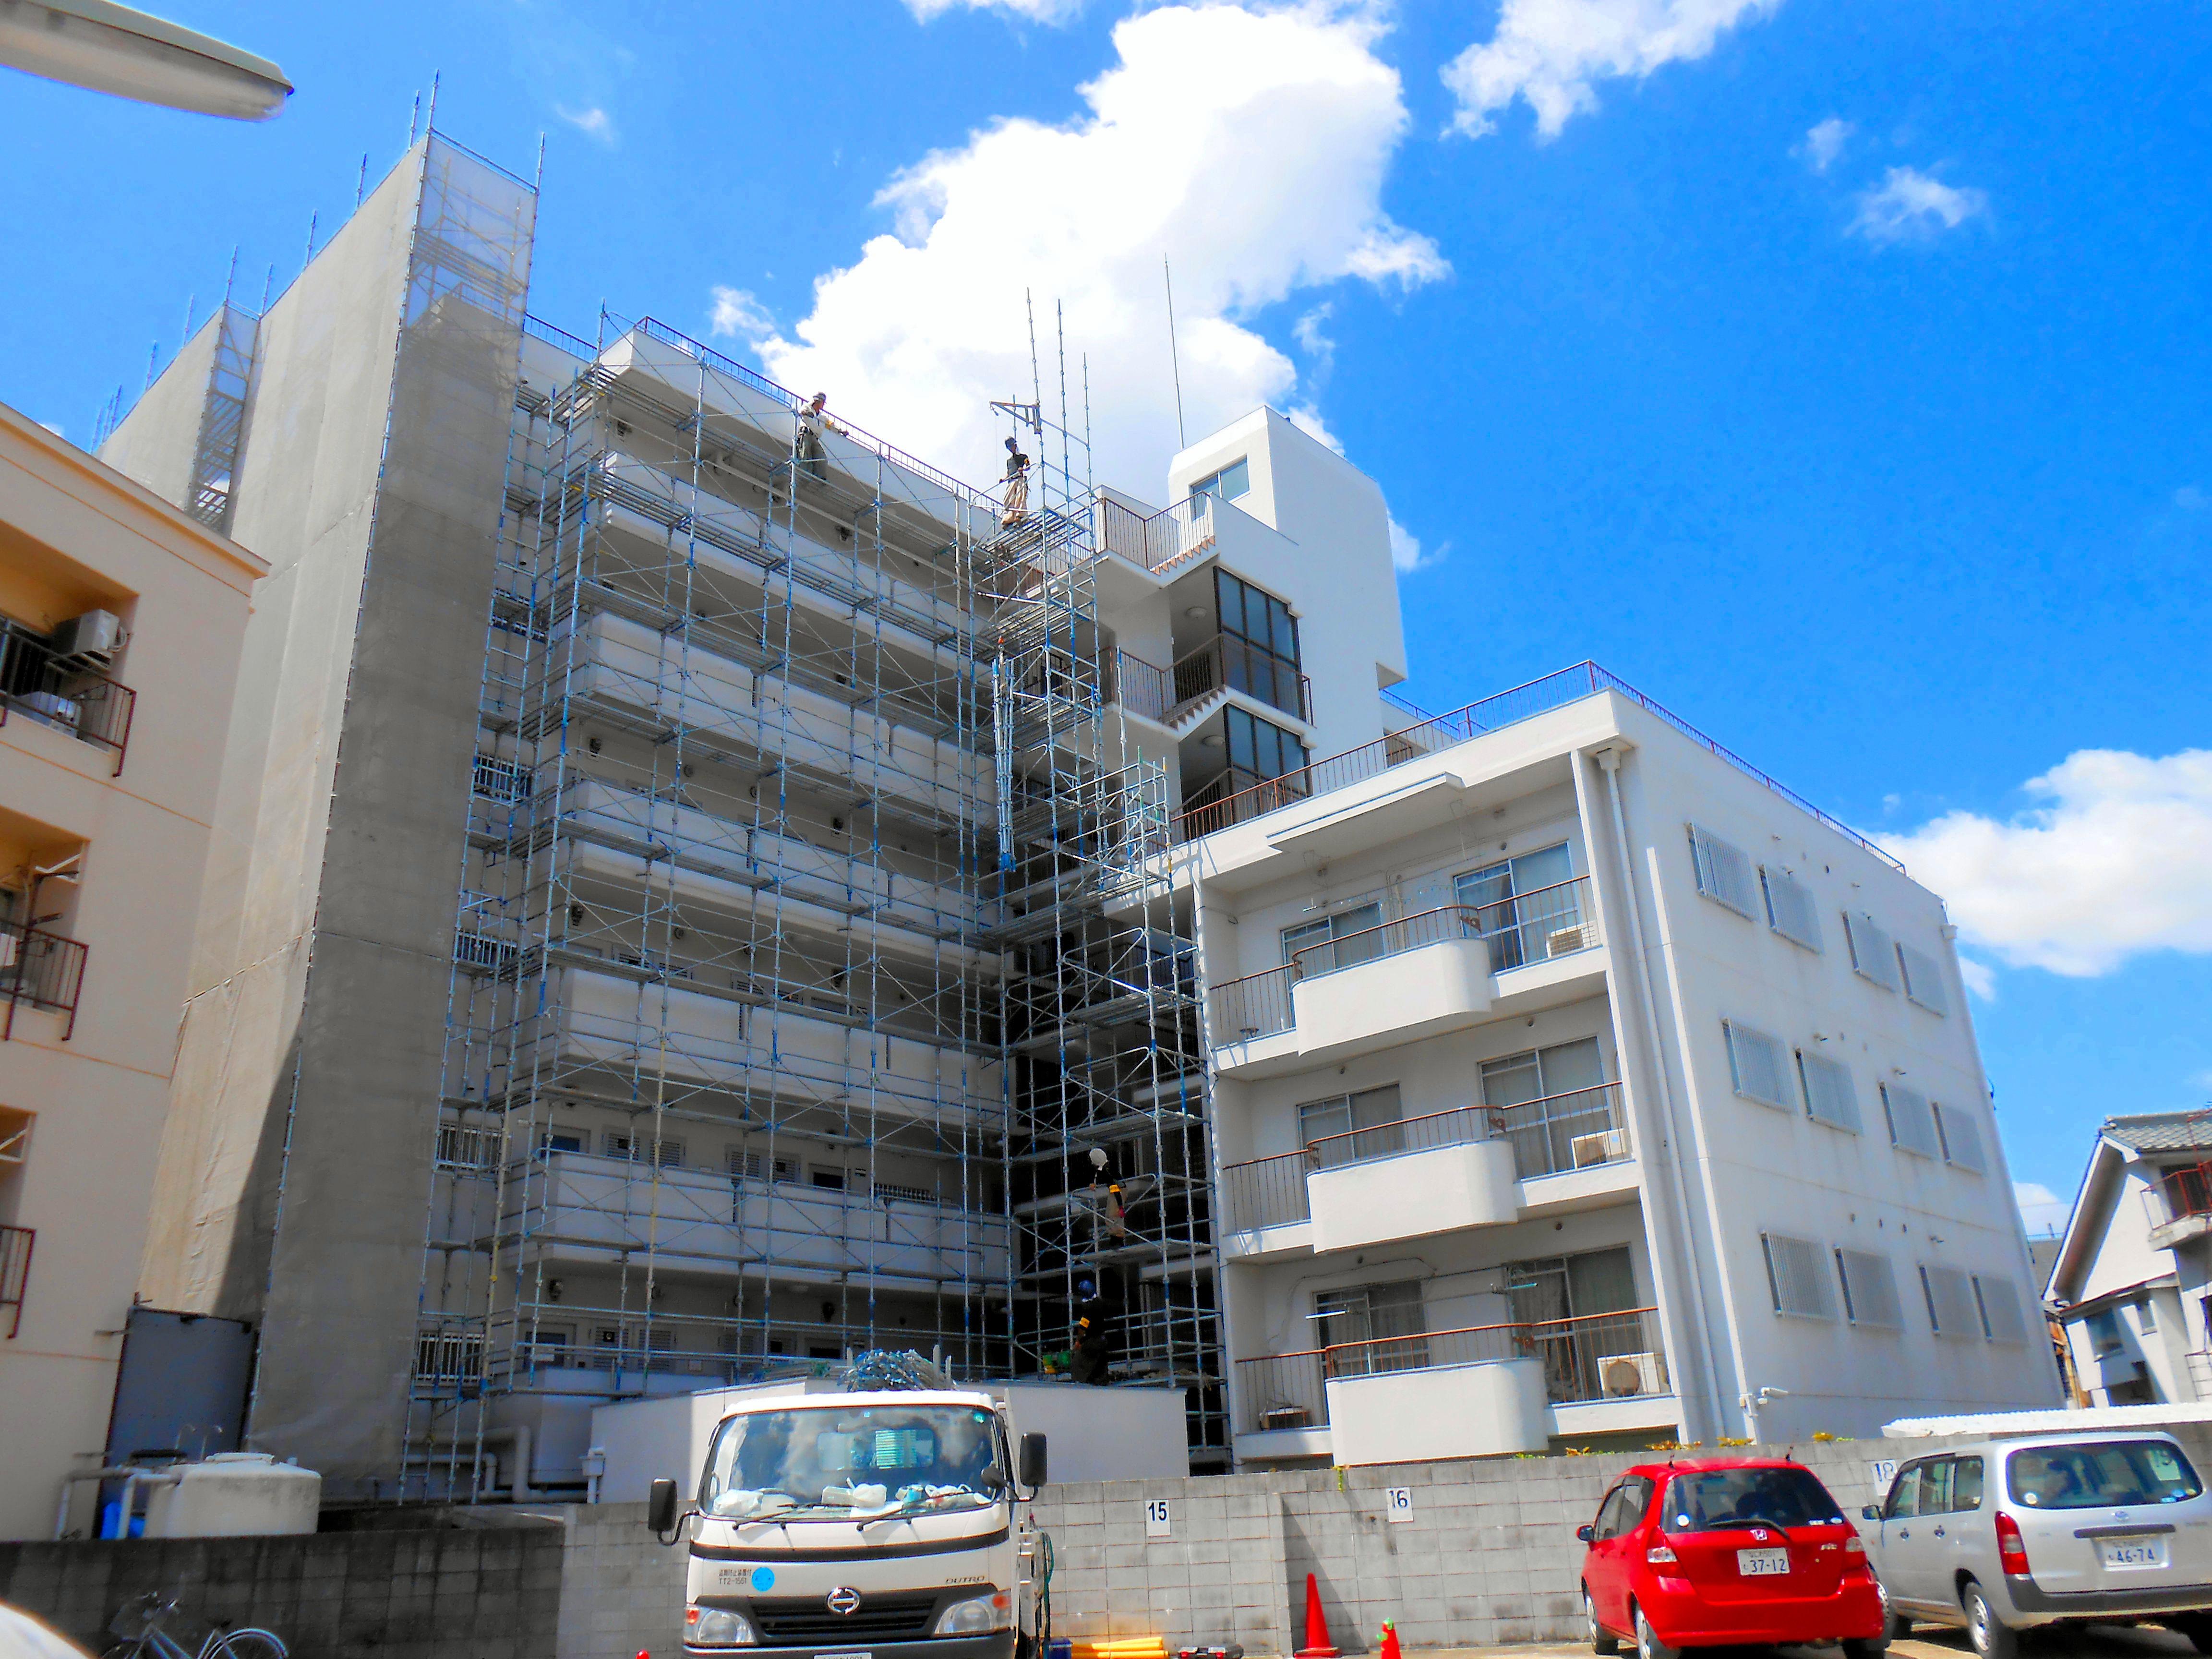 グレースコーポ都島大規模修繕工事(大阪府大阪市)